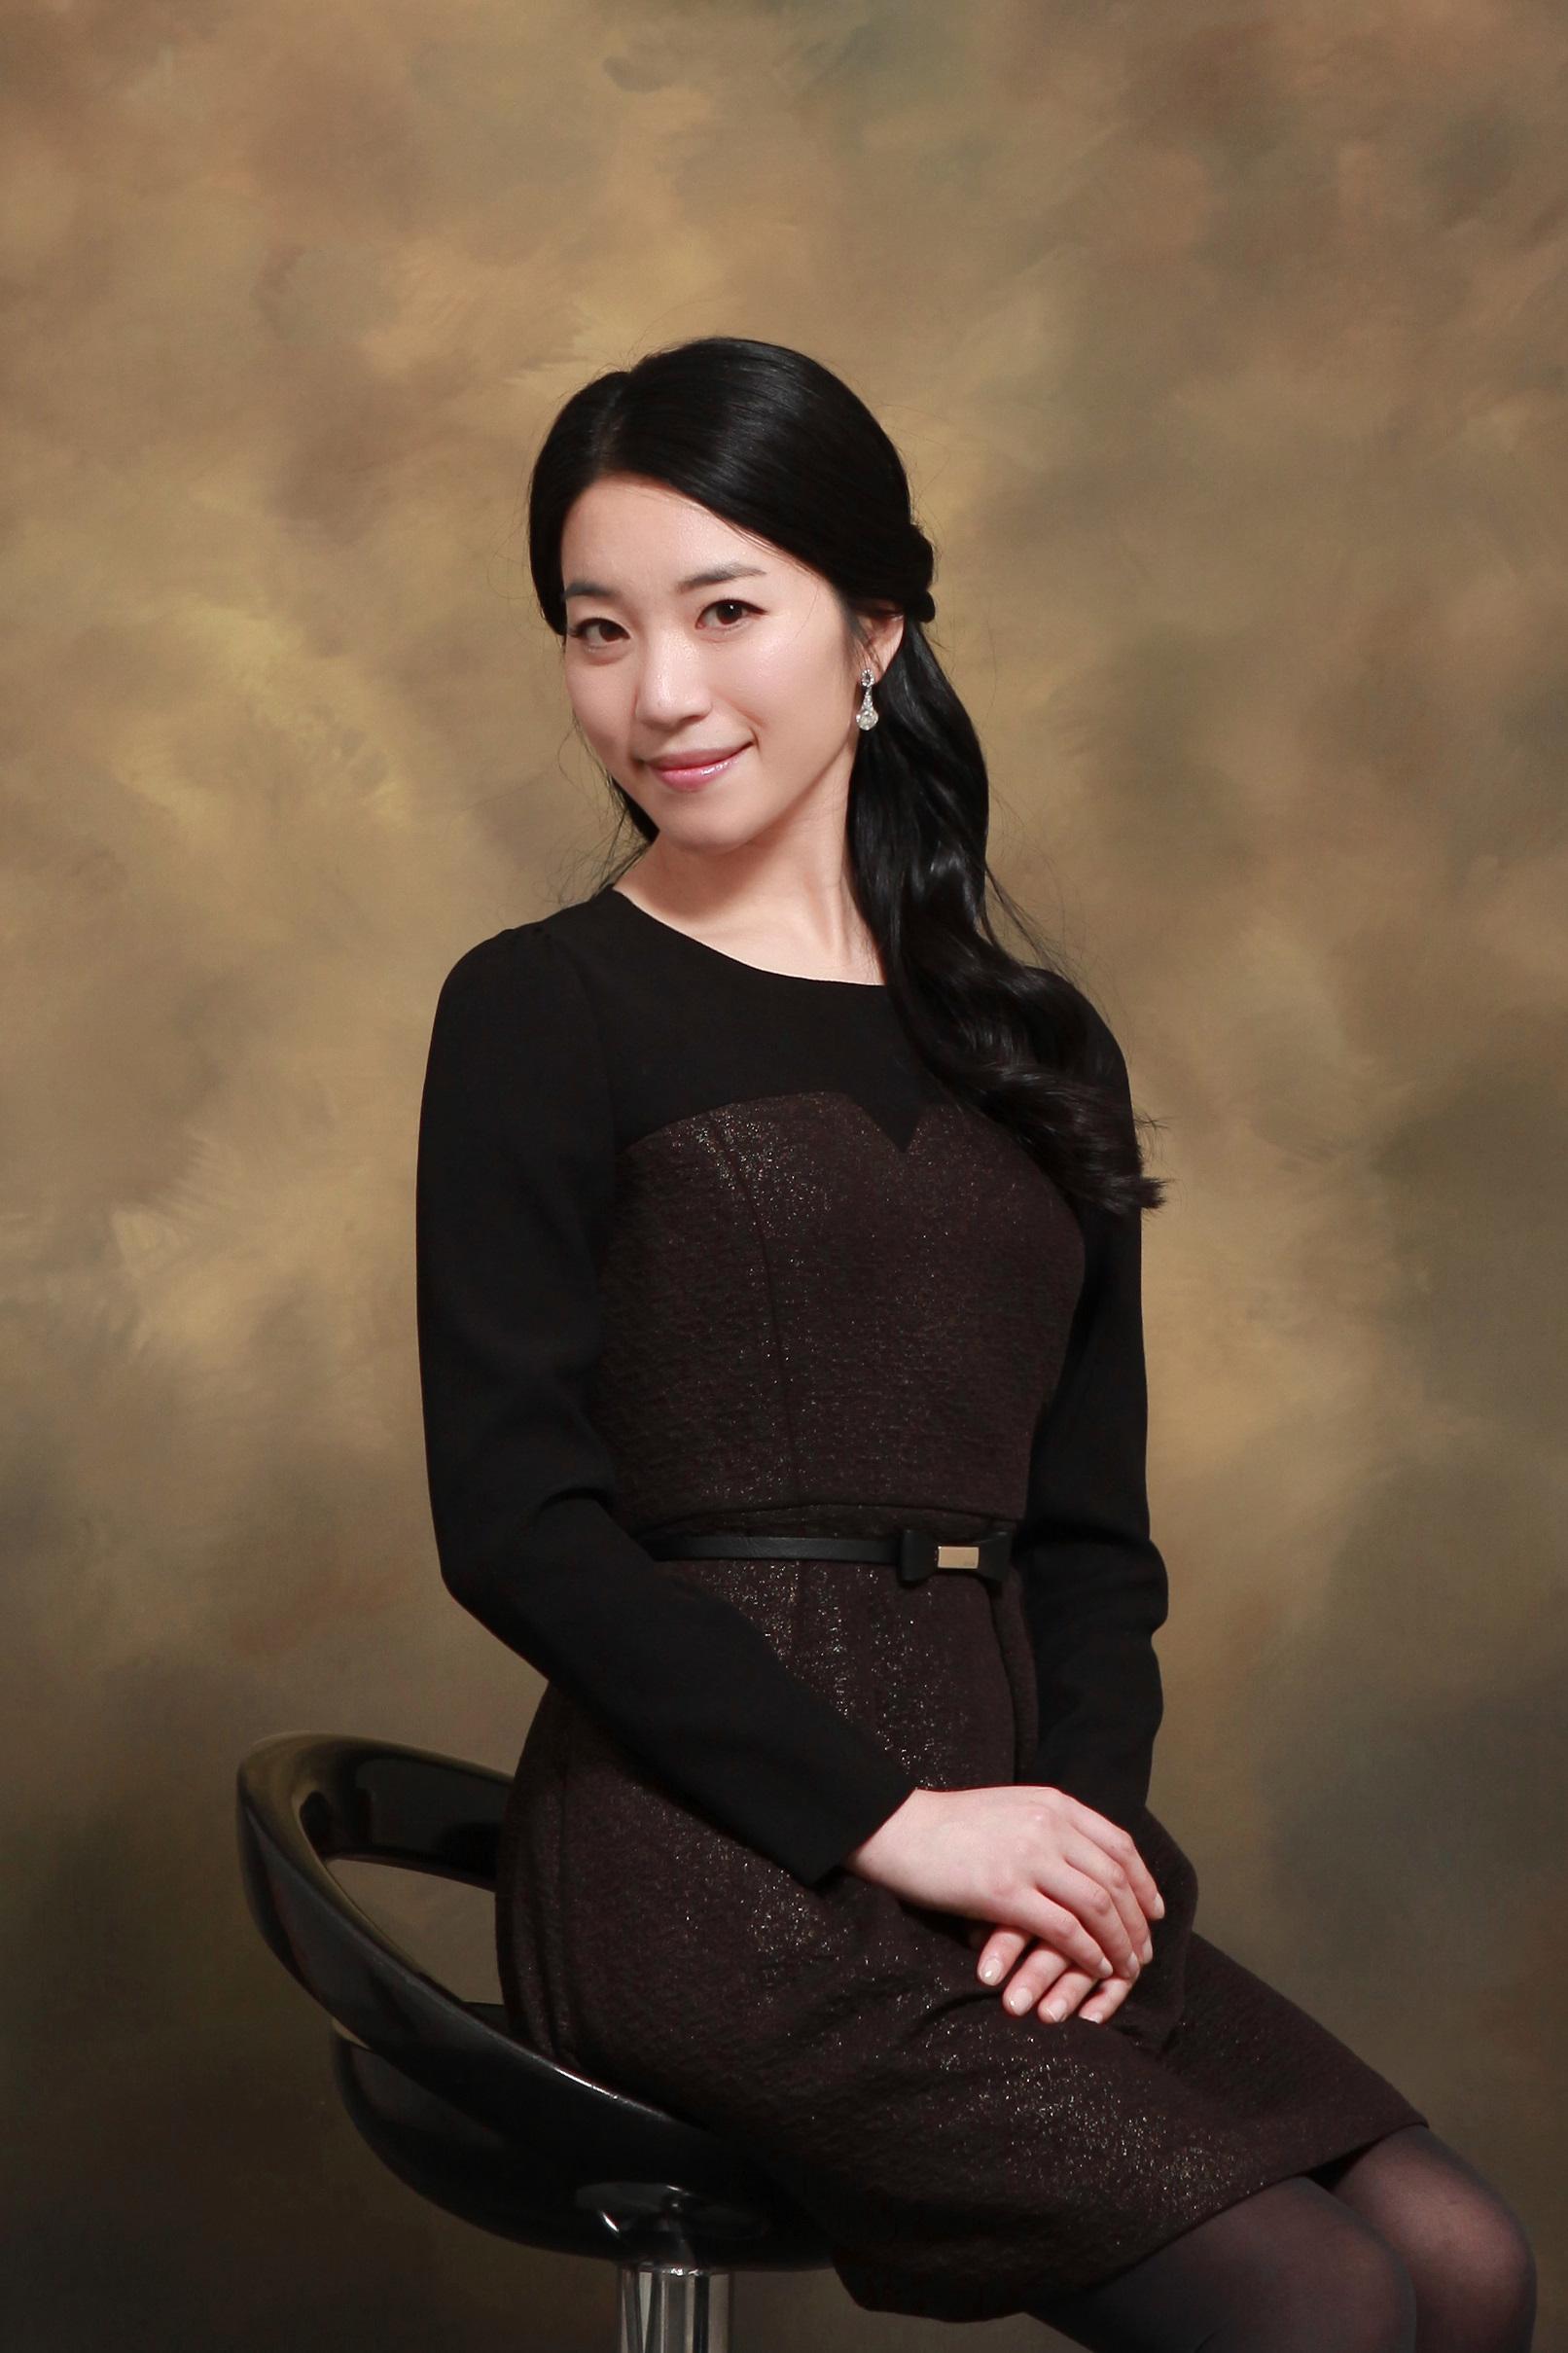 Mina Lee, South Korea